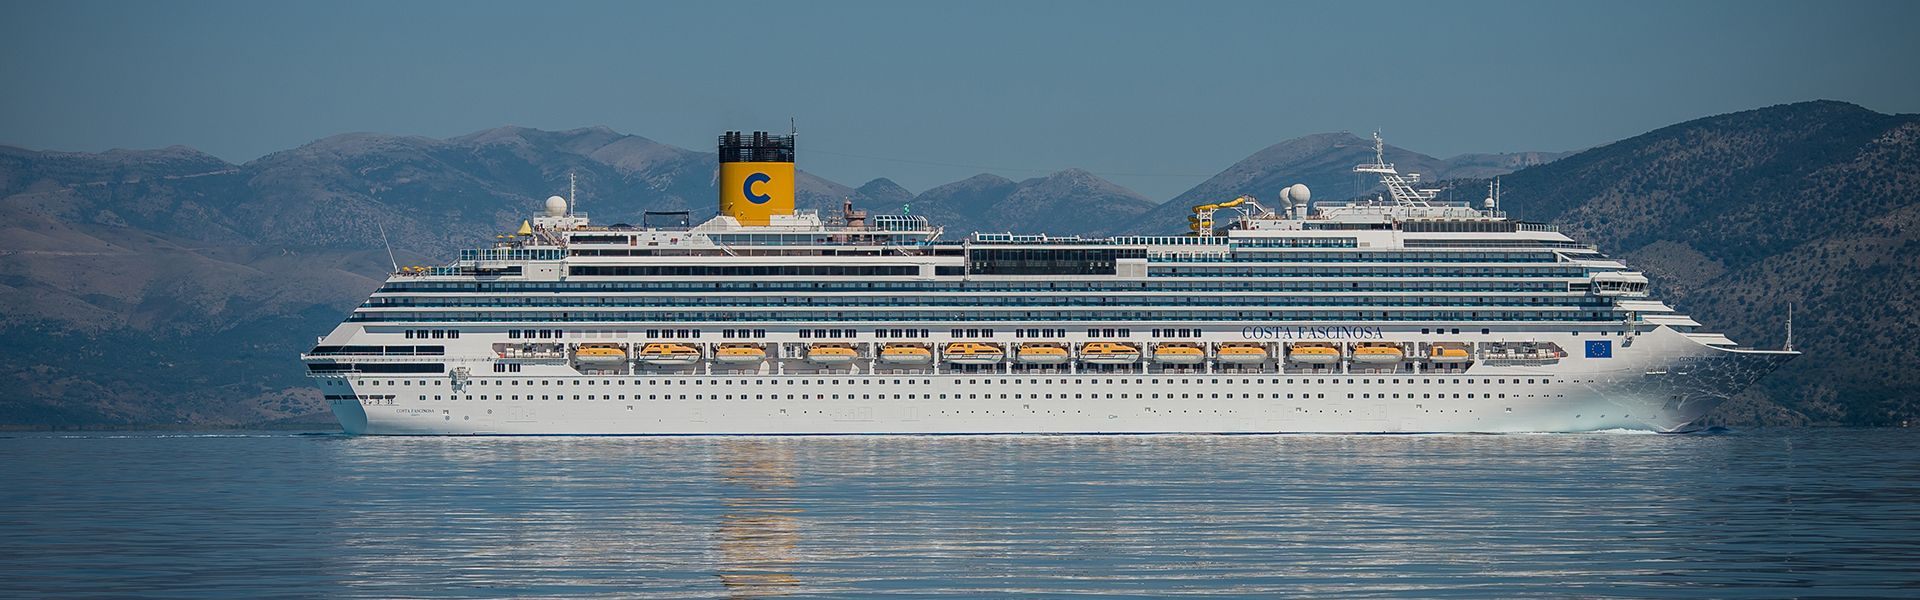 Croaziera 2017 - Mediterana de Vest (Marsilia) - Costa Cruises - Costa Fascinosa - 7 nopti